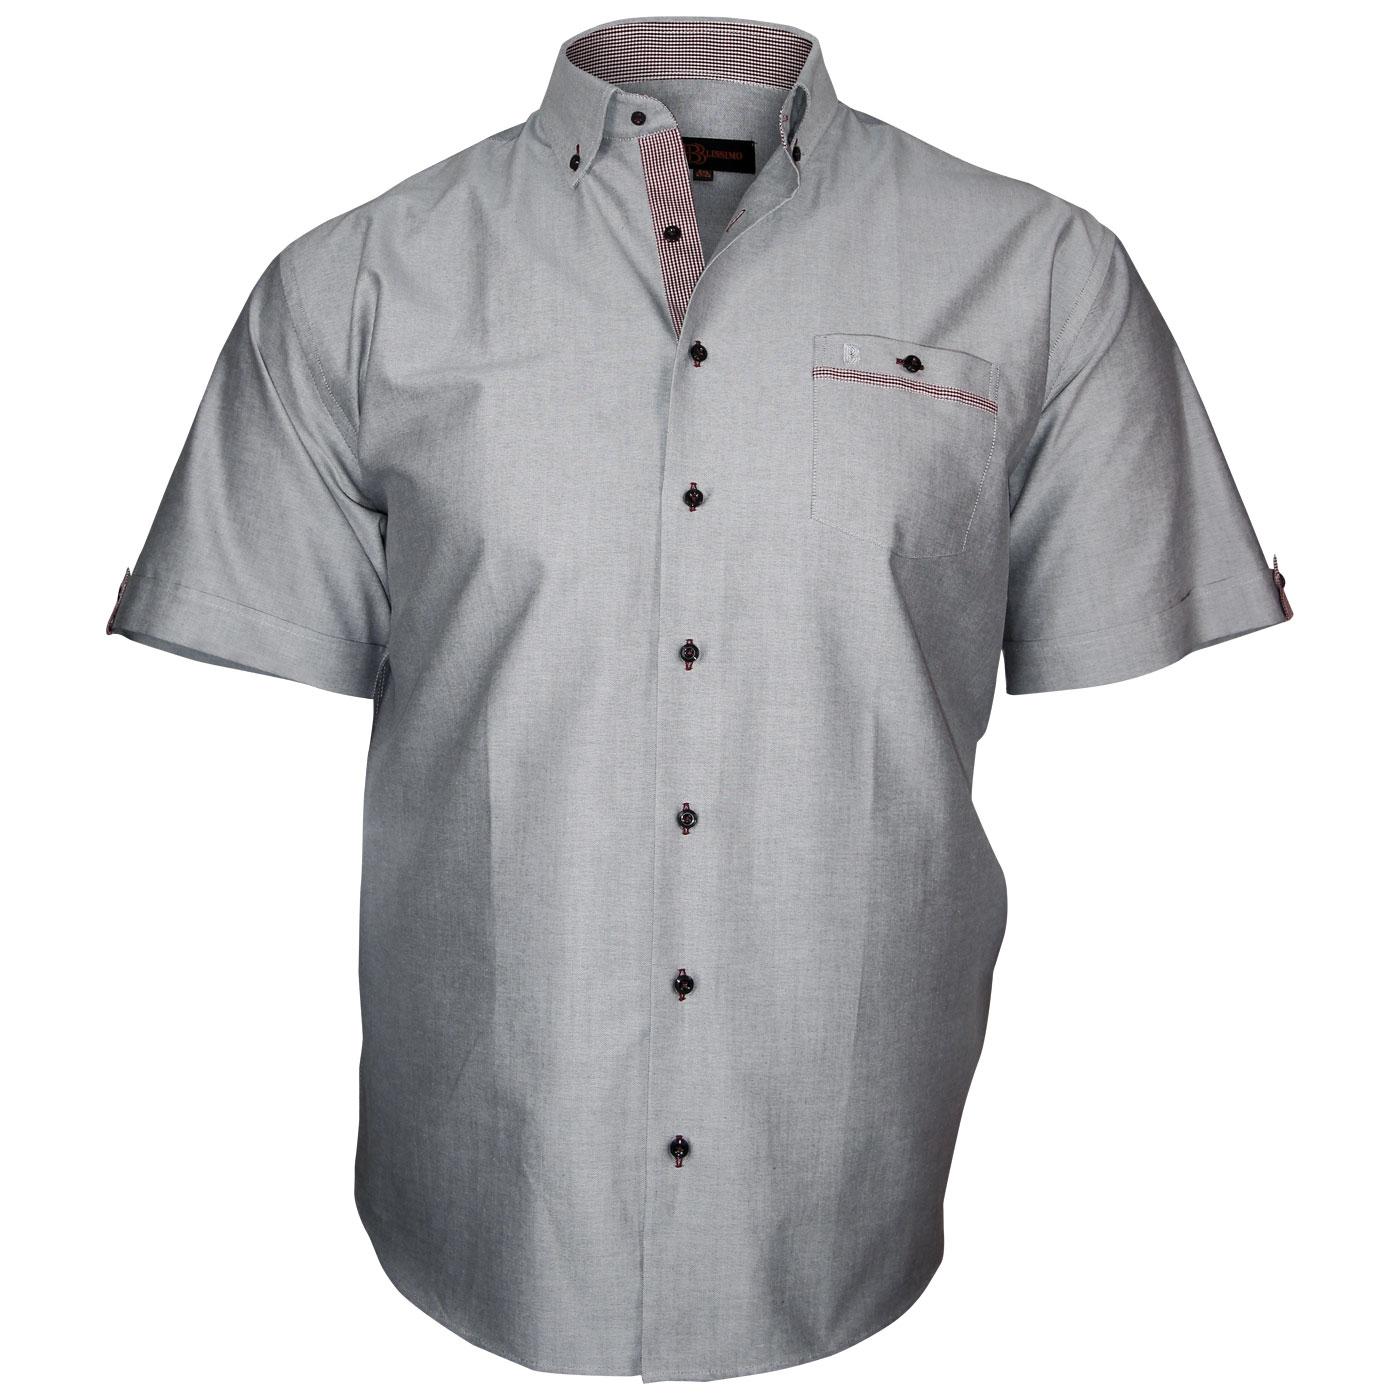 chemise grande taille marque doublissimo par chemiseweb. Black Bedroom Furniture Sets. Home Design Ideas